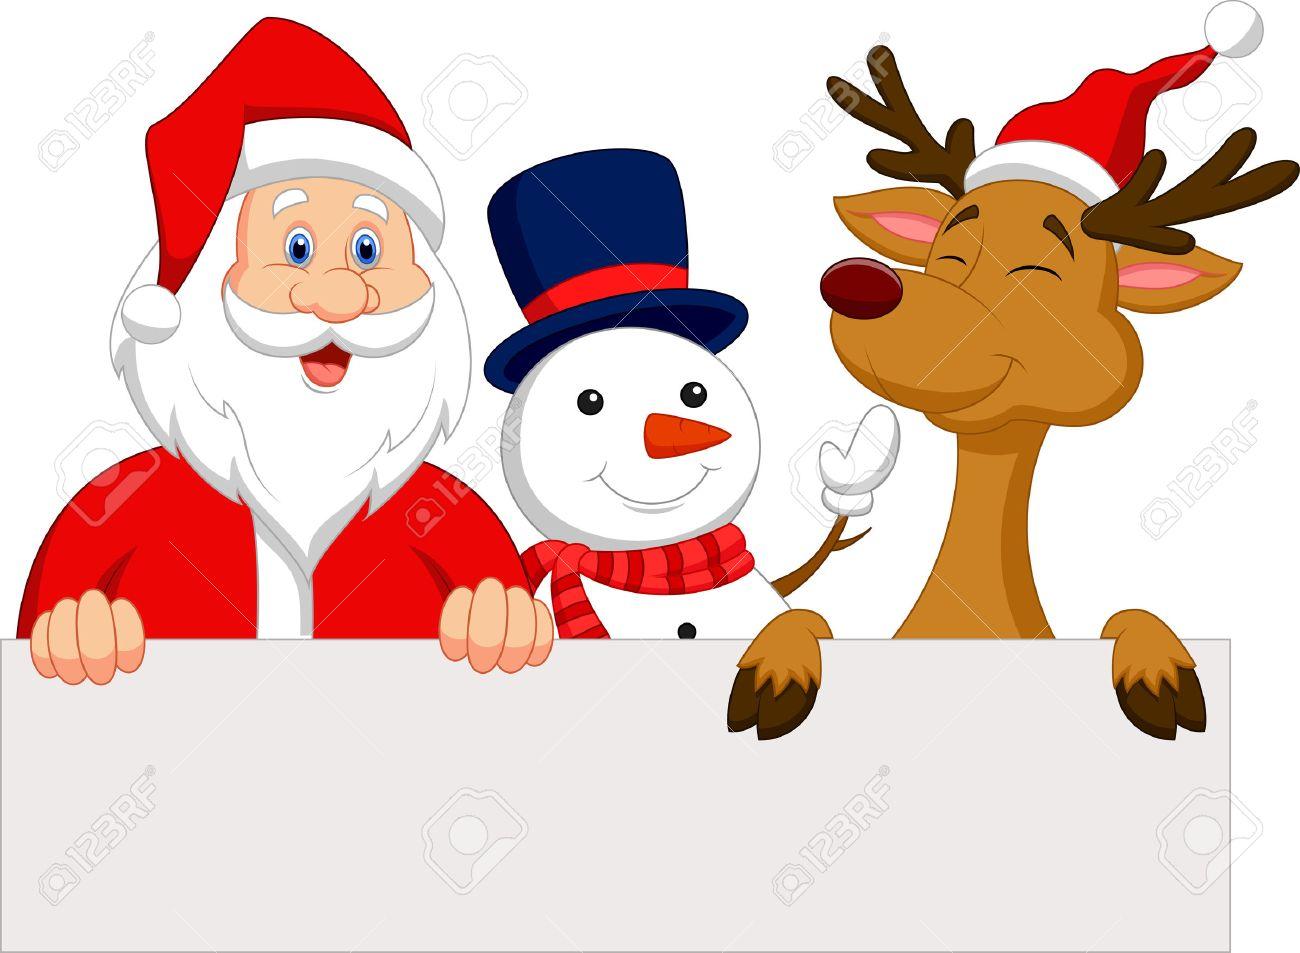 Uncategorized Imagenes Santa Claus cartoon santa claus reindeer and snowman with blank sign royalty stock vector 22466888